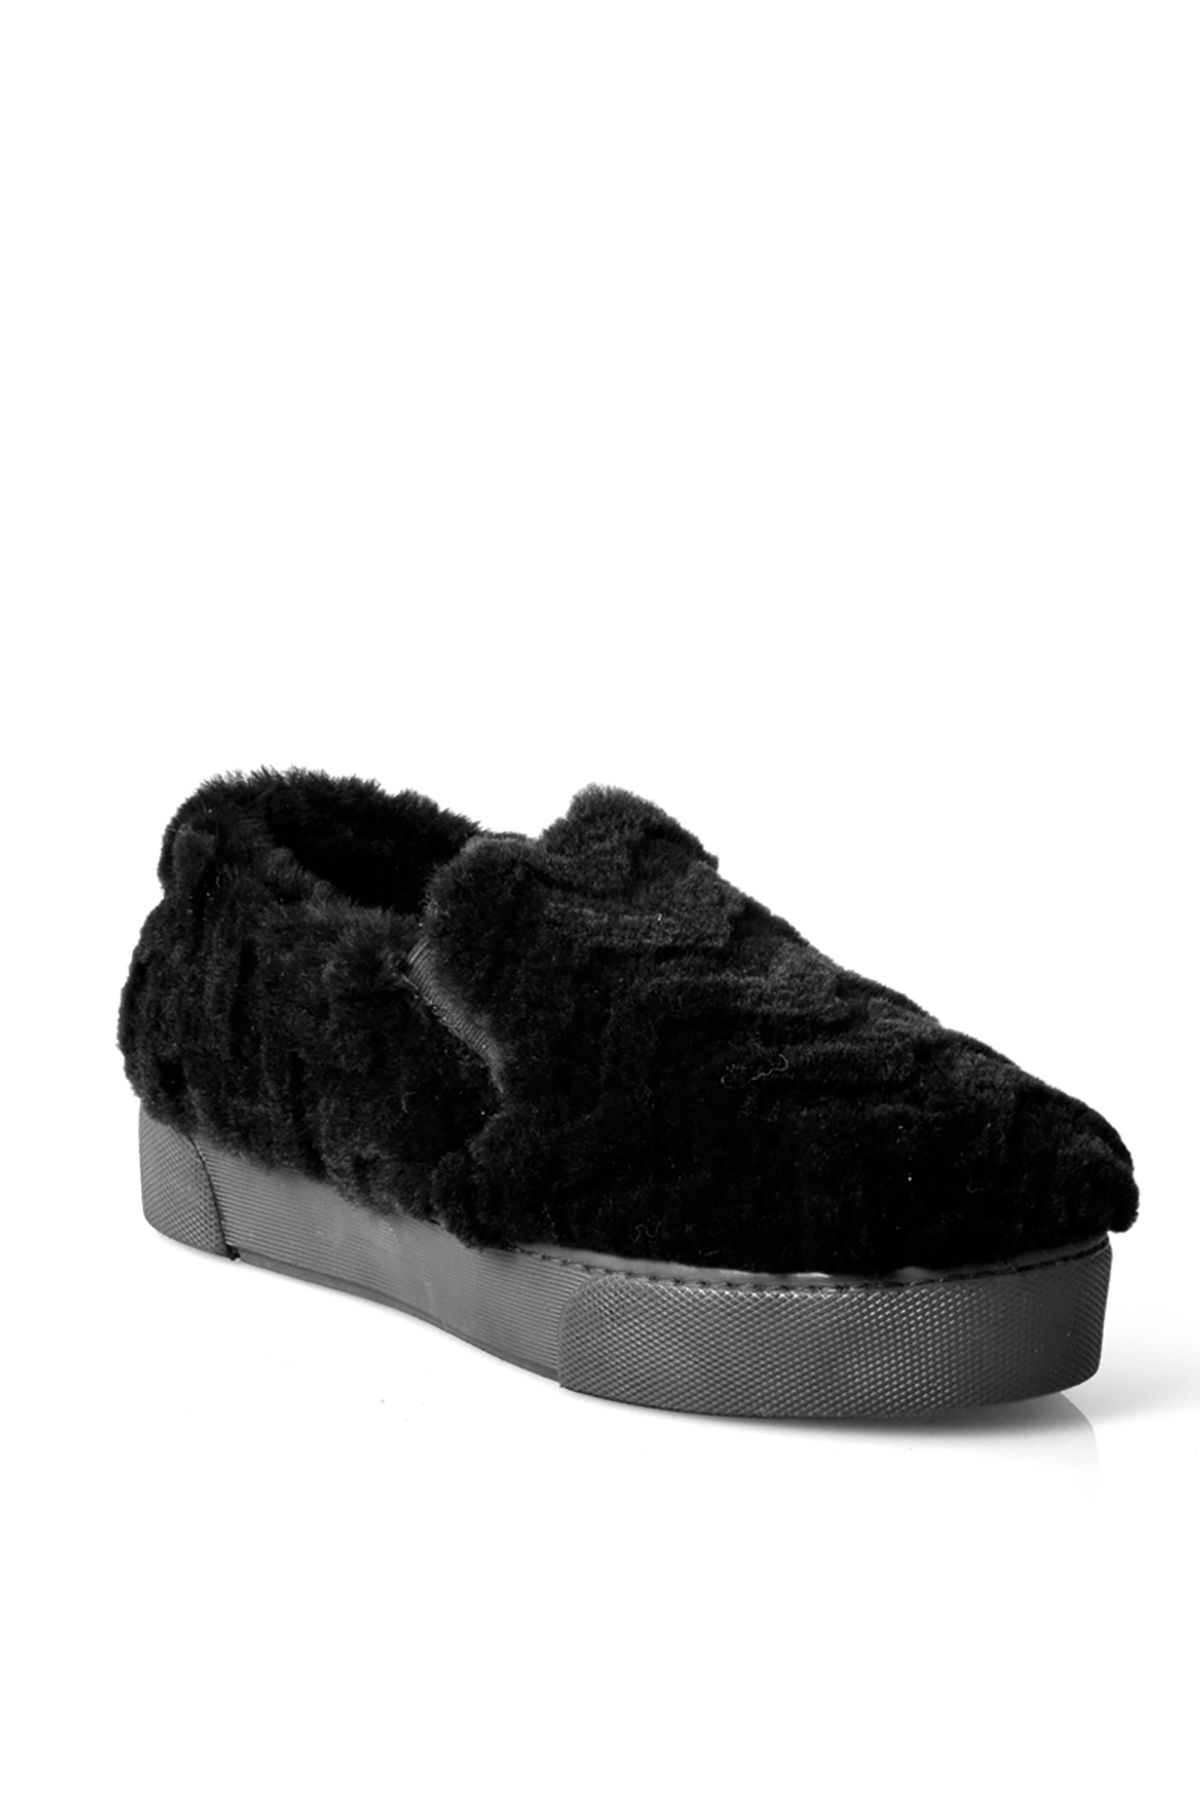 Pegia Women Sneakers From Genuine Fur Black